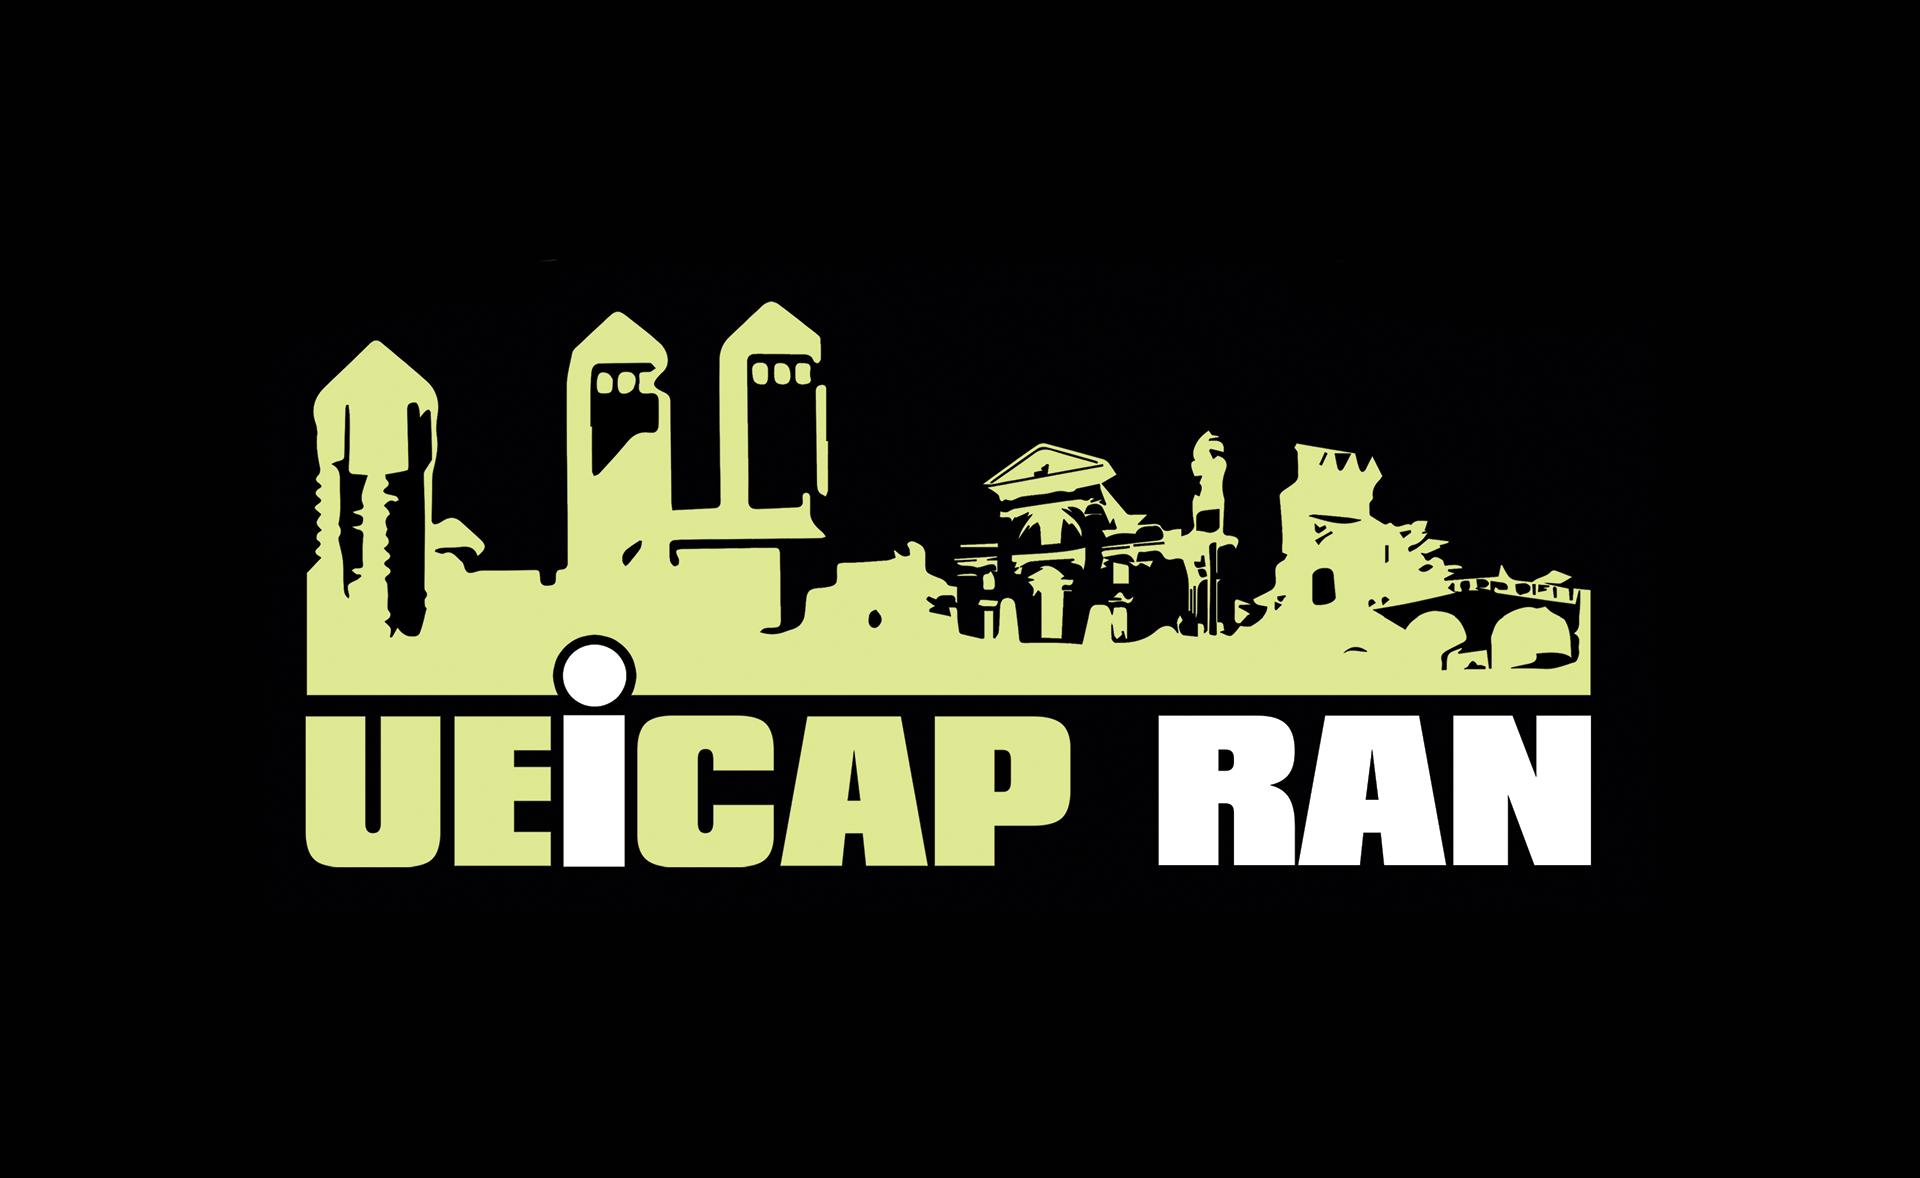 UEICAP RAN 2019